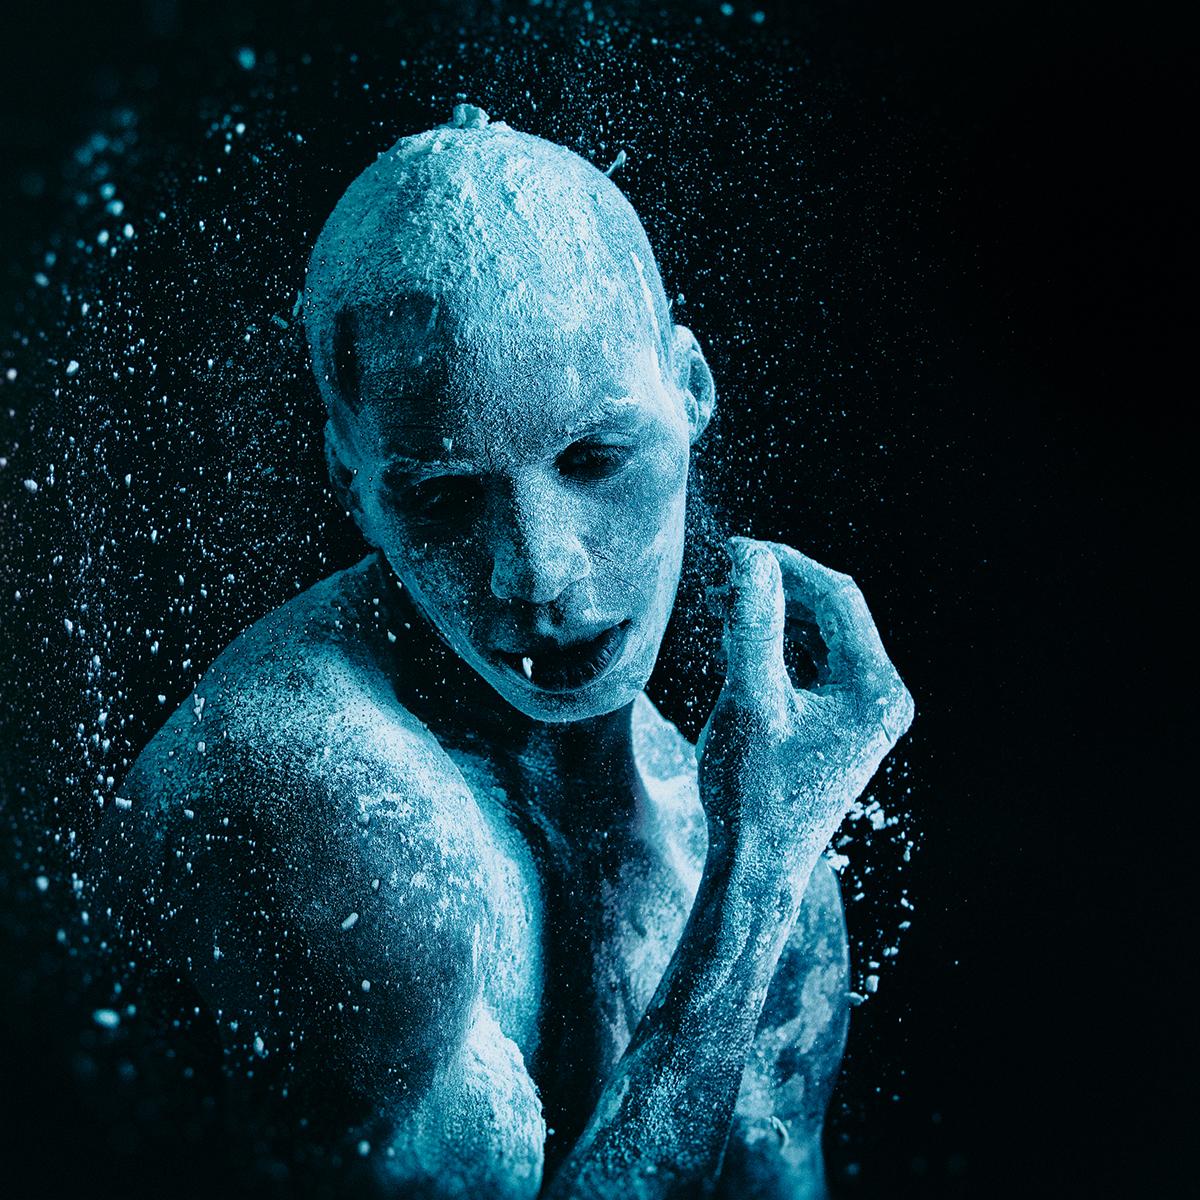 Michelle Caudle (Silver Moon Custom Art & Photography ig SilverMoonCustomArt) - Lorenzo Edwards - ast Megan Powers